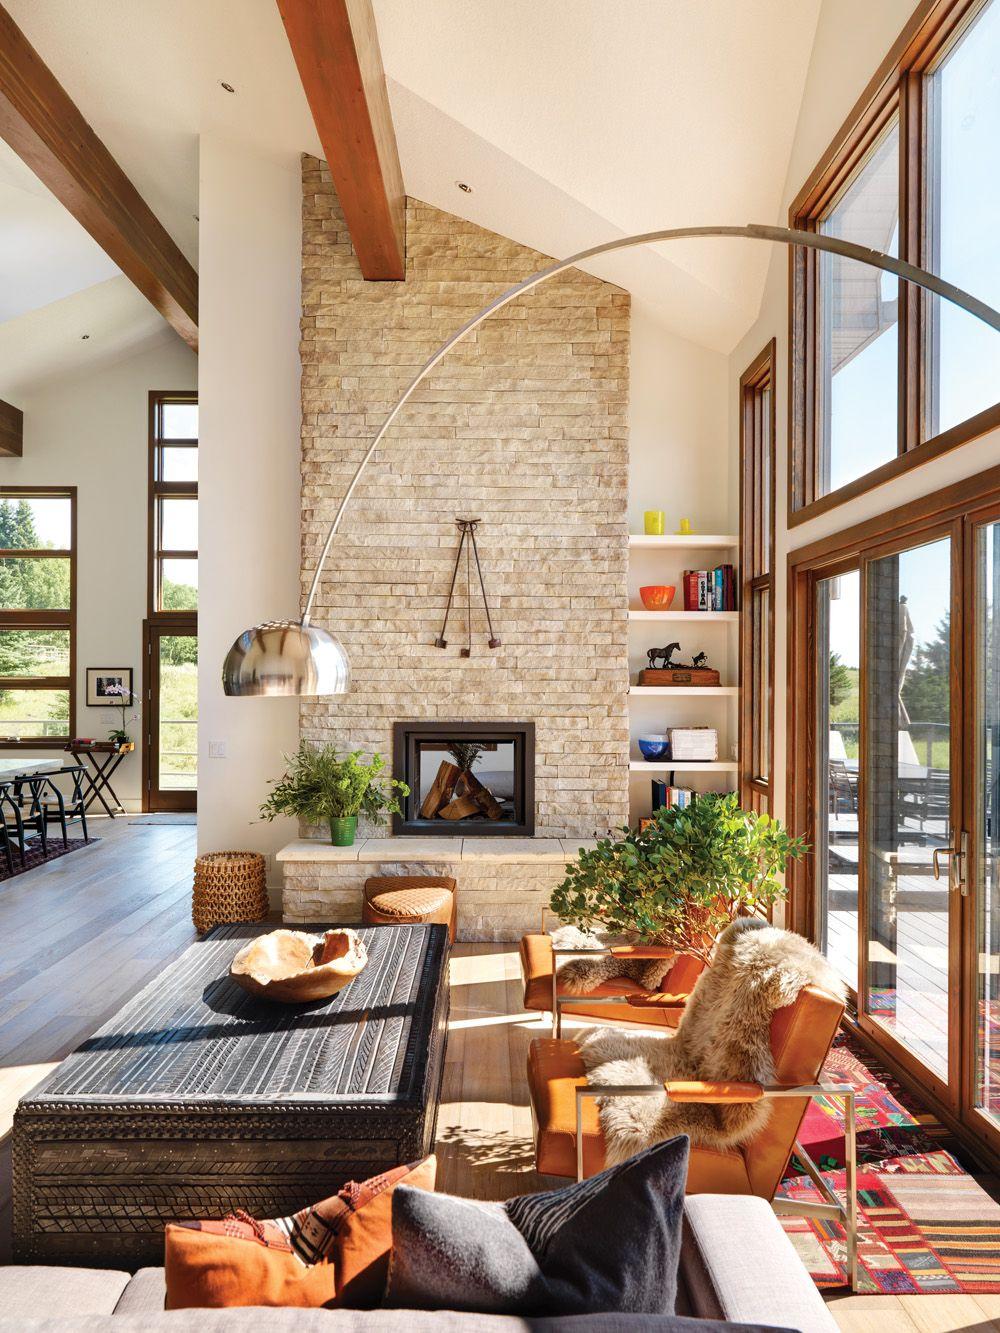 Inspiring Style Modern Ranch In Southern Alberta Western Living